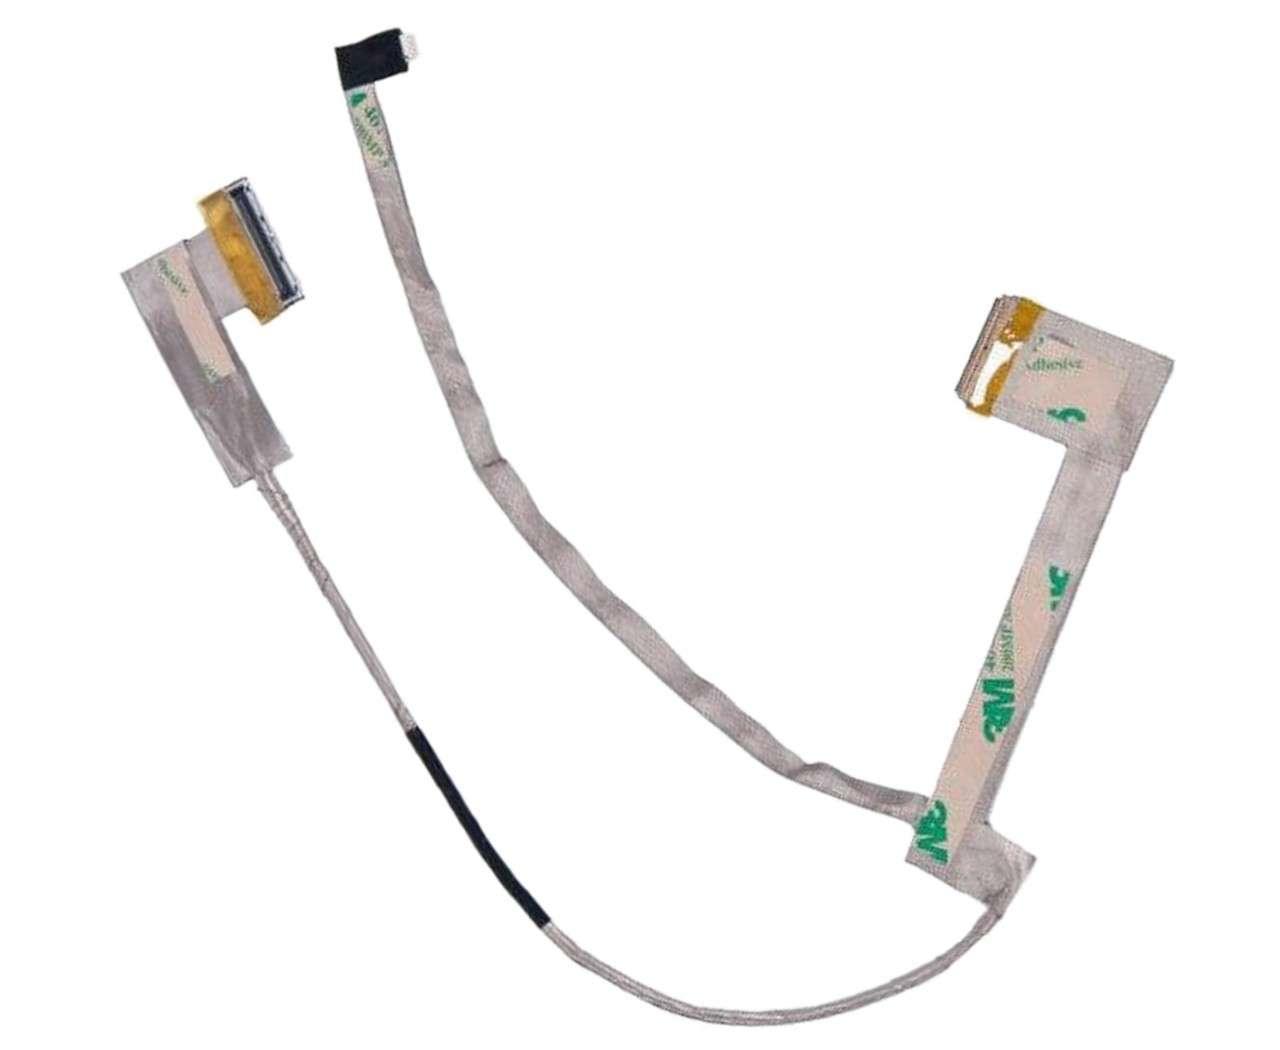 Cablu video LVDS Lenovo 50 4JW09 001 imagine powerlaptop.ro 2021